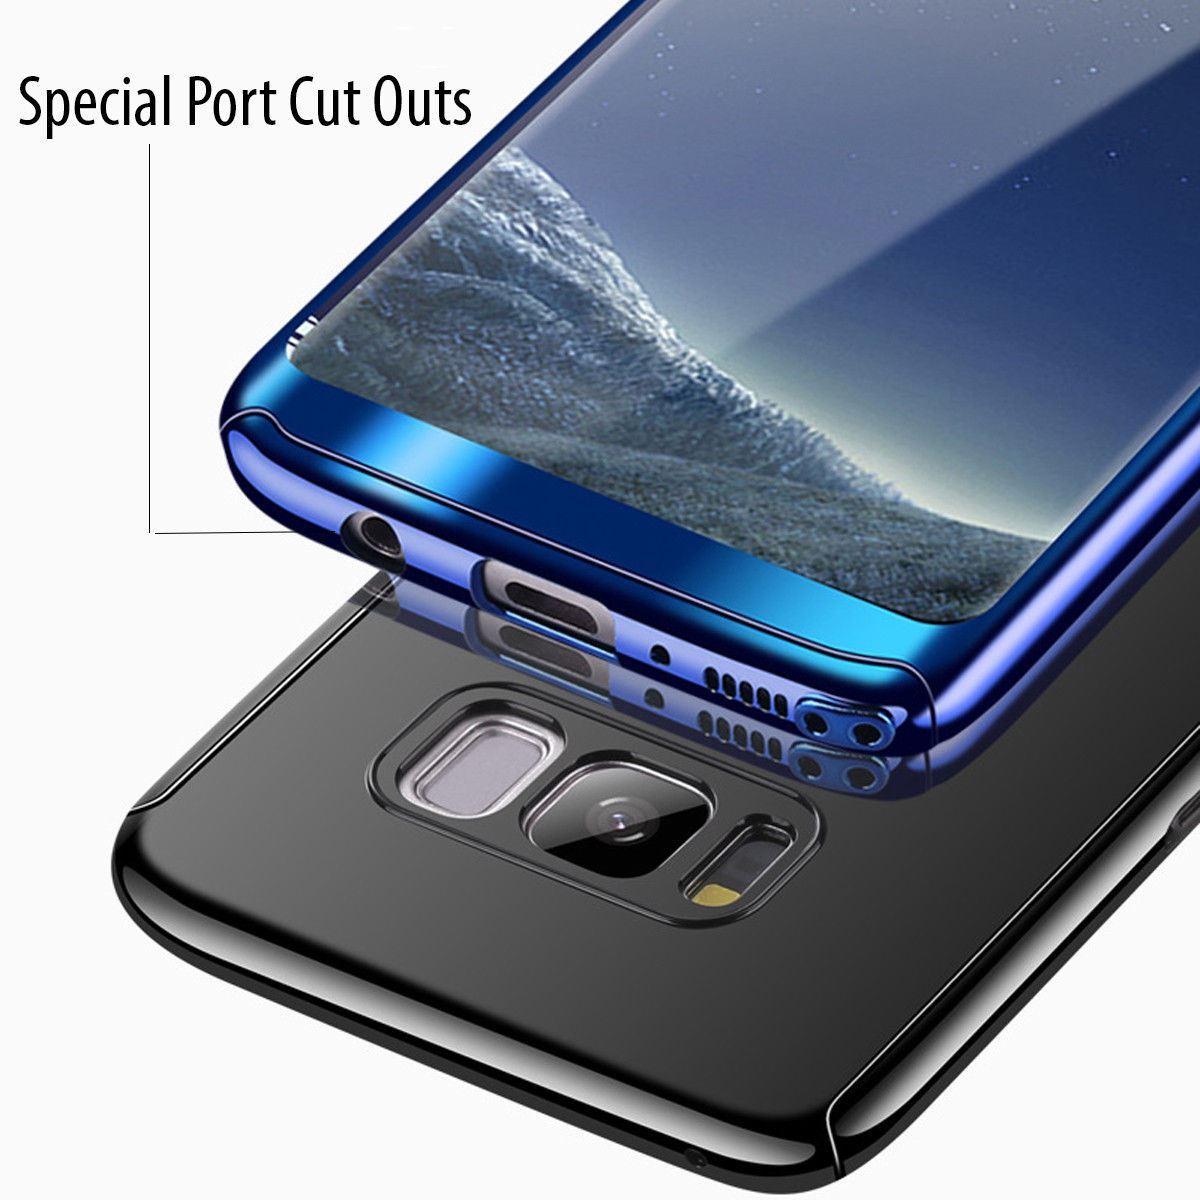 Shockproof-Hybrid-360-Ultra-Thin-Mirror-Hard-Case-Samsung-Galaxy-S7-edge-S8-S9 thumbnail 47